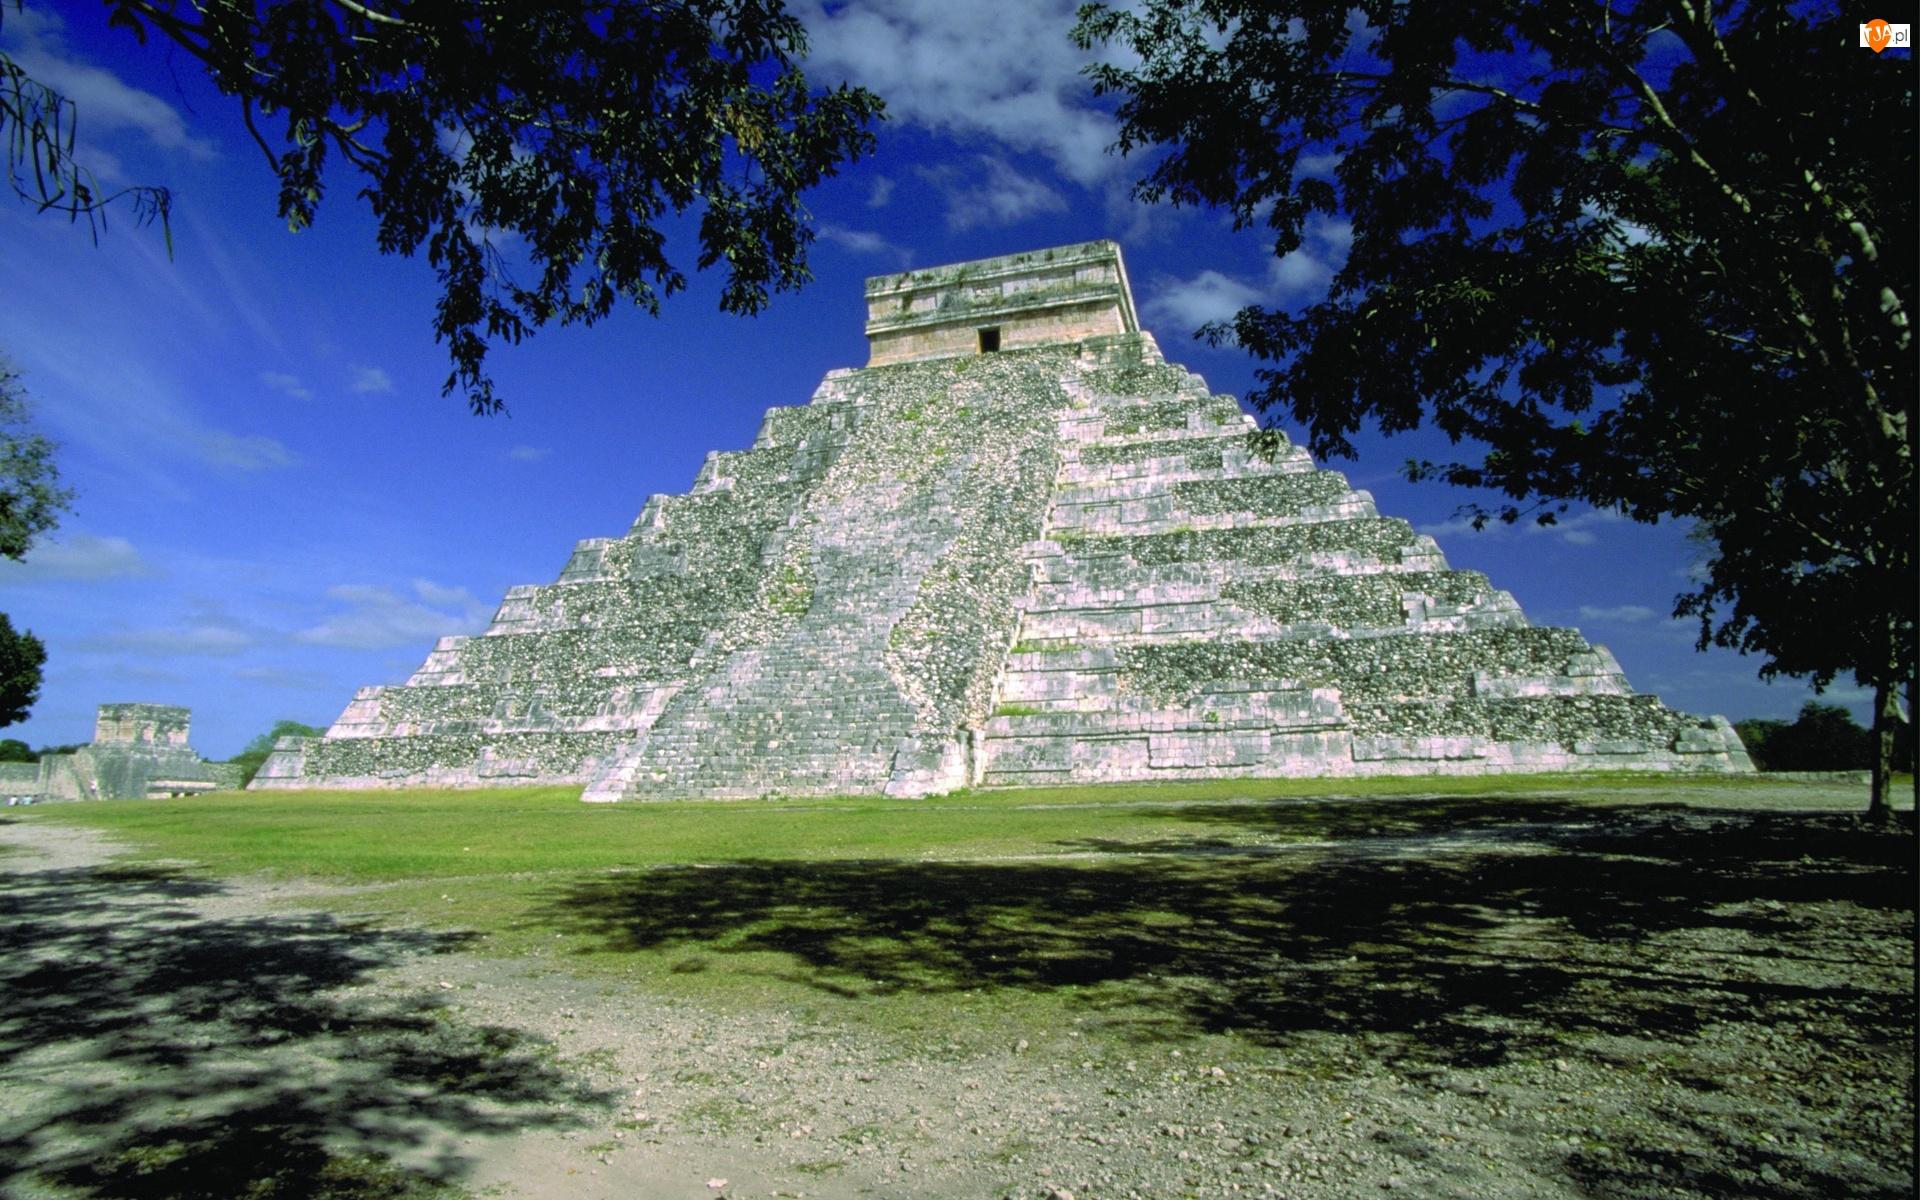 Niebo, Piramida, Drzewa